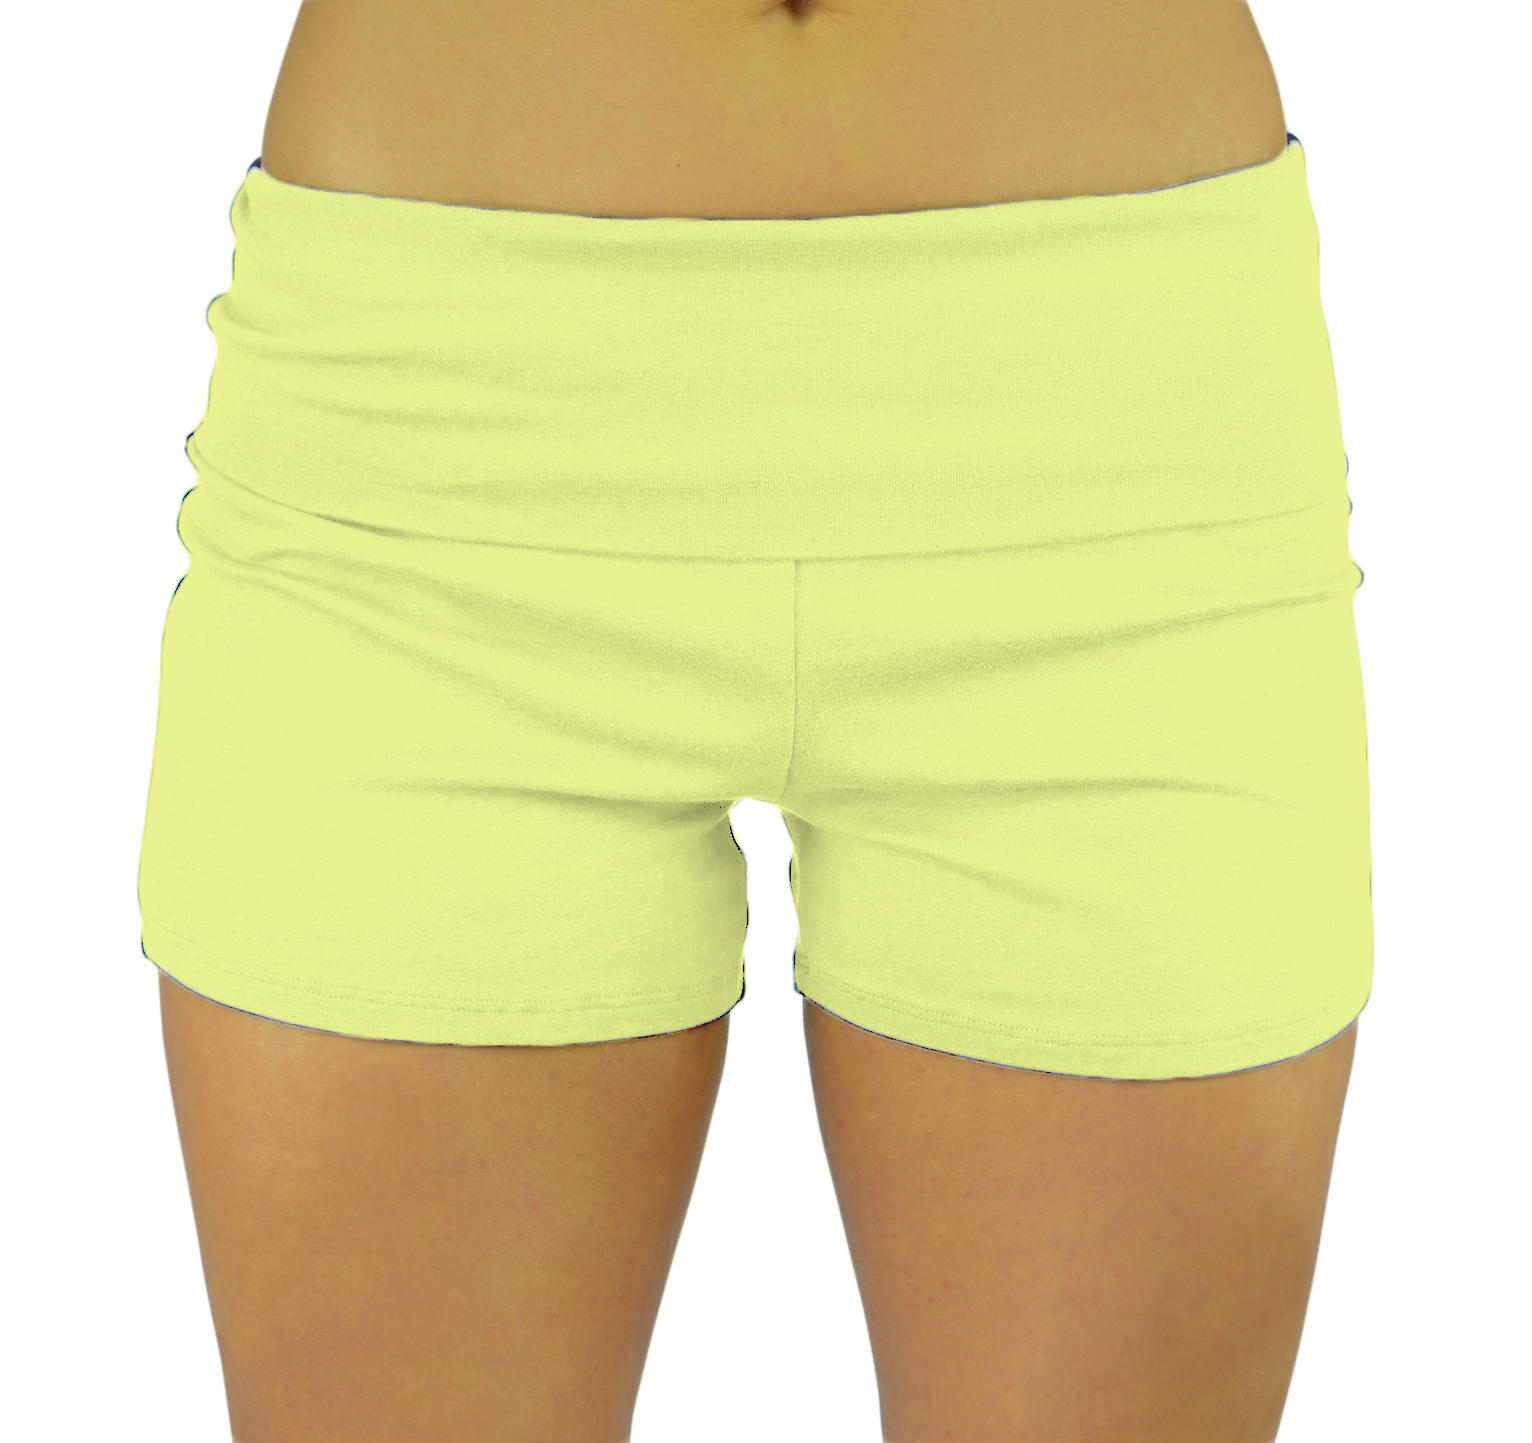 Belle Donne Womens Cotton Yoga Shorts - Foldover Cotton Spandex Girls Bike Running Boyshorts by Neon Lemon/S